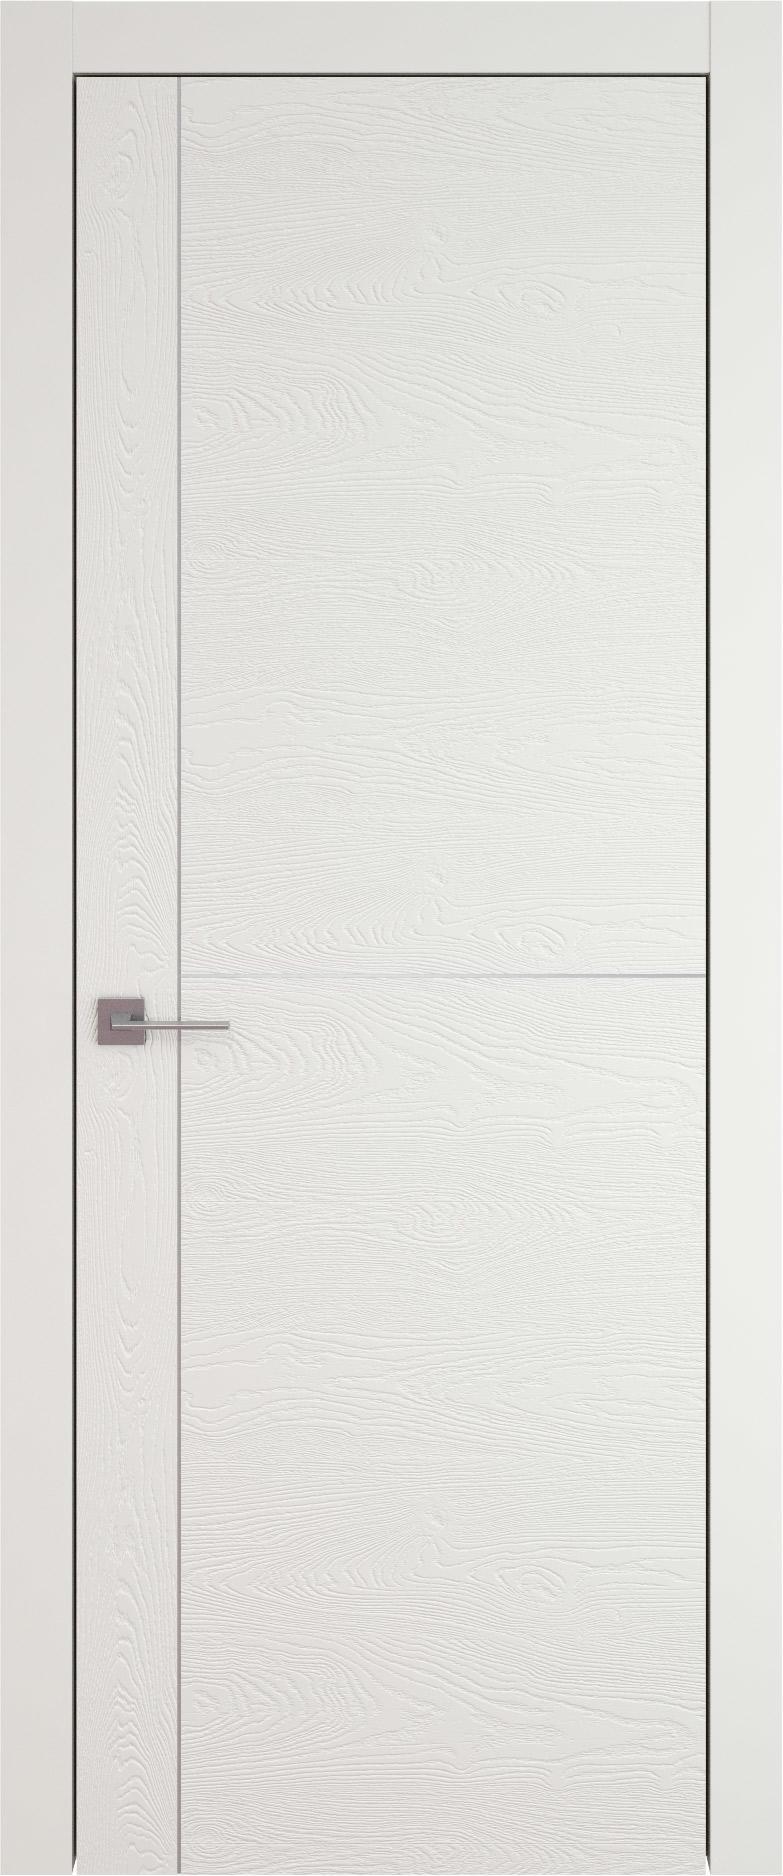 Tivoli Е-3 цвет - Бежевая эмаль по шпону (RAL 9010) Без стекла (ДГ)